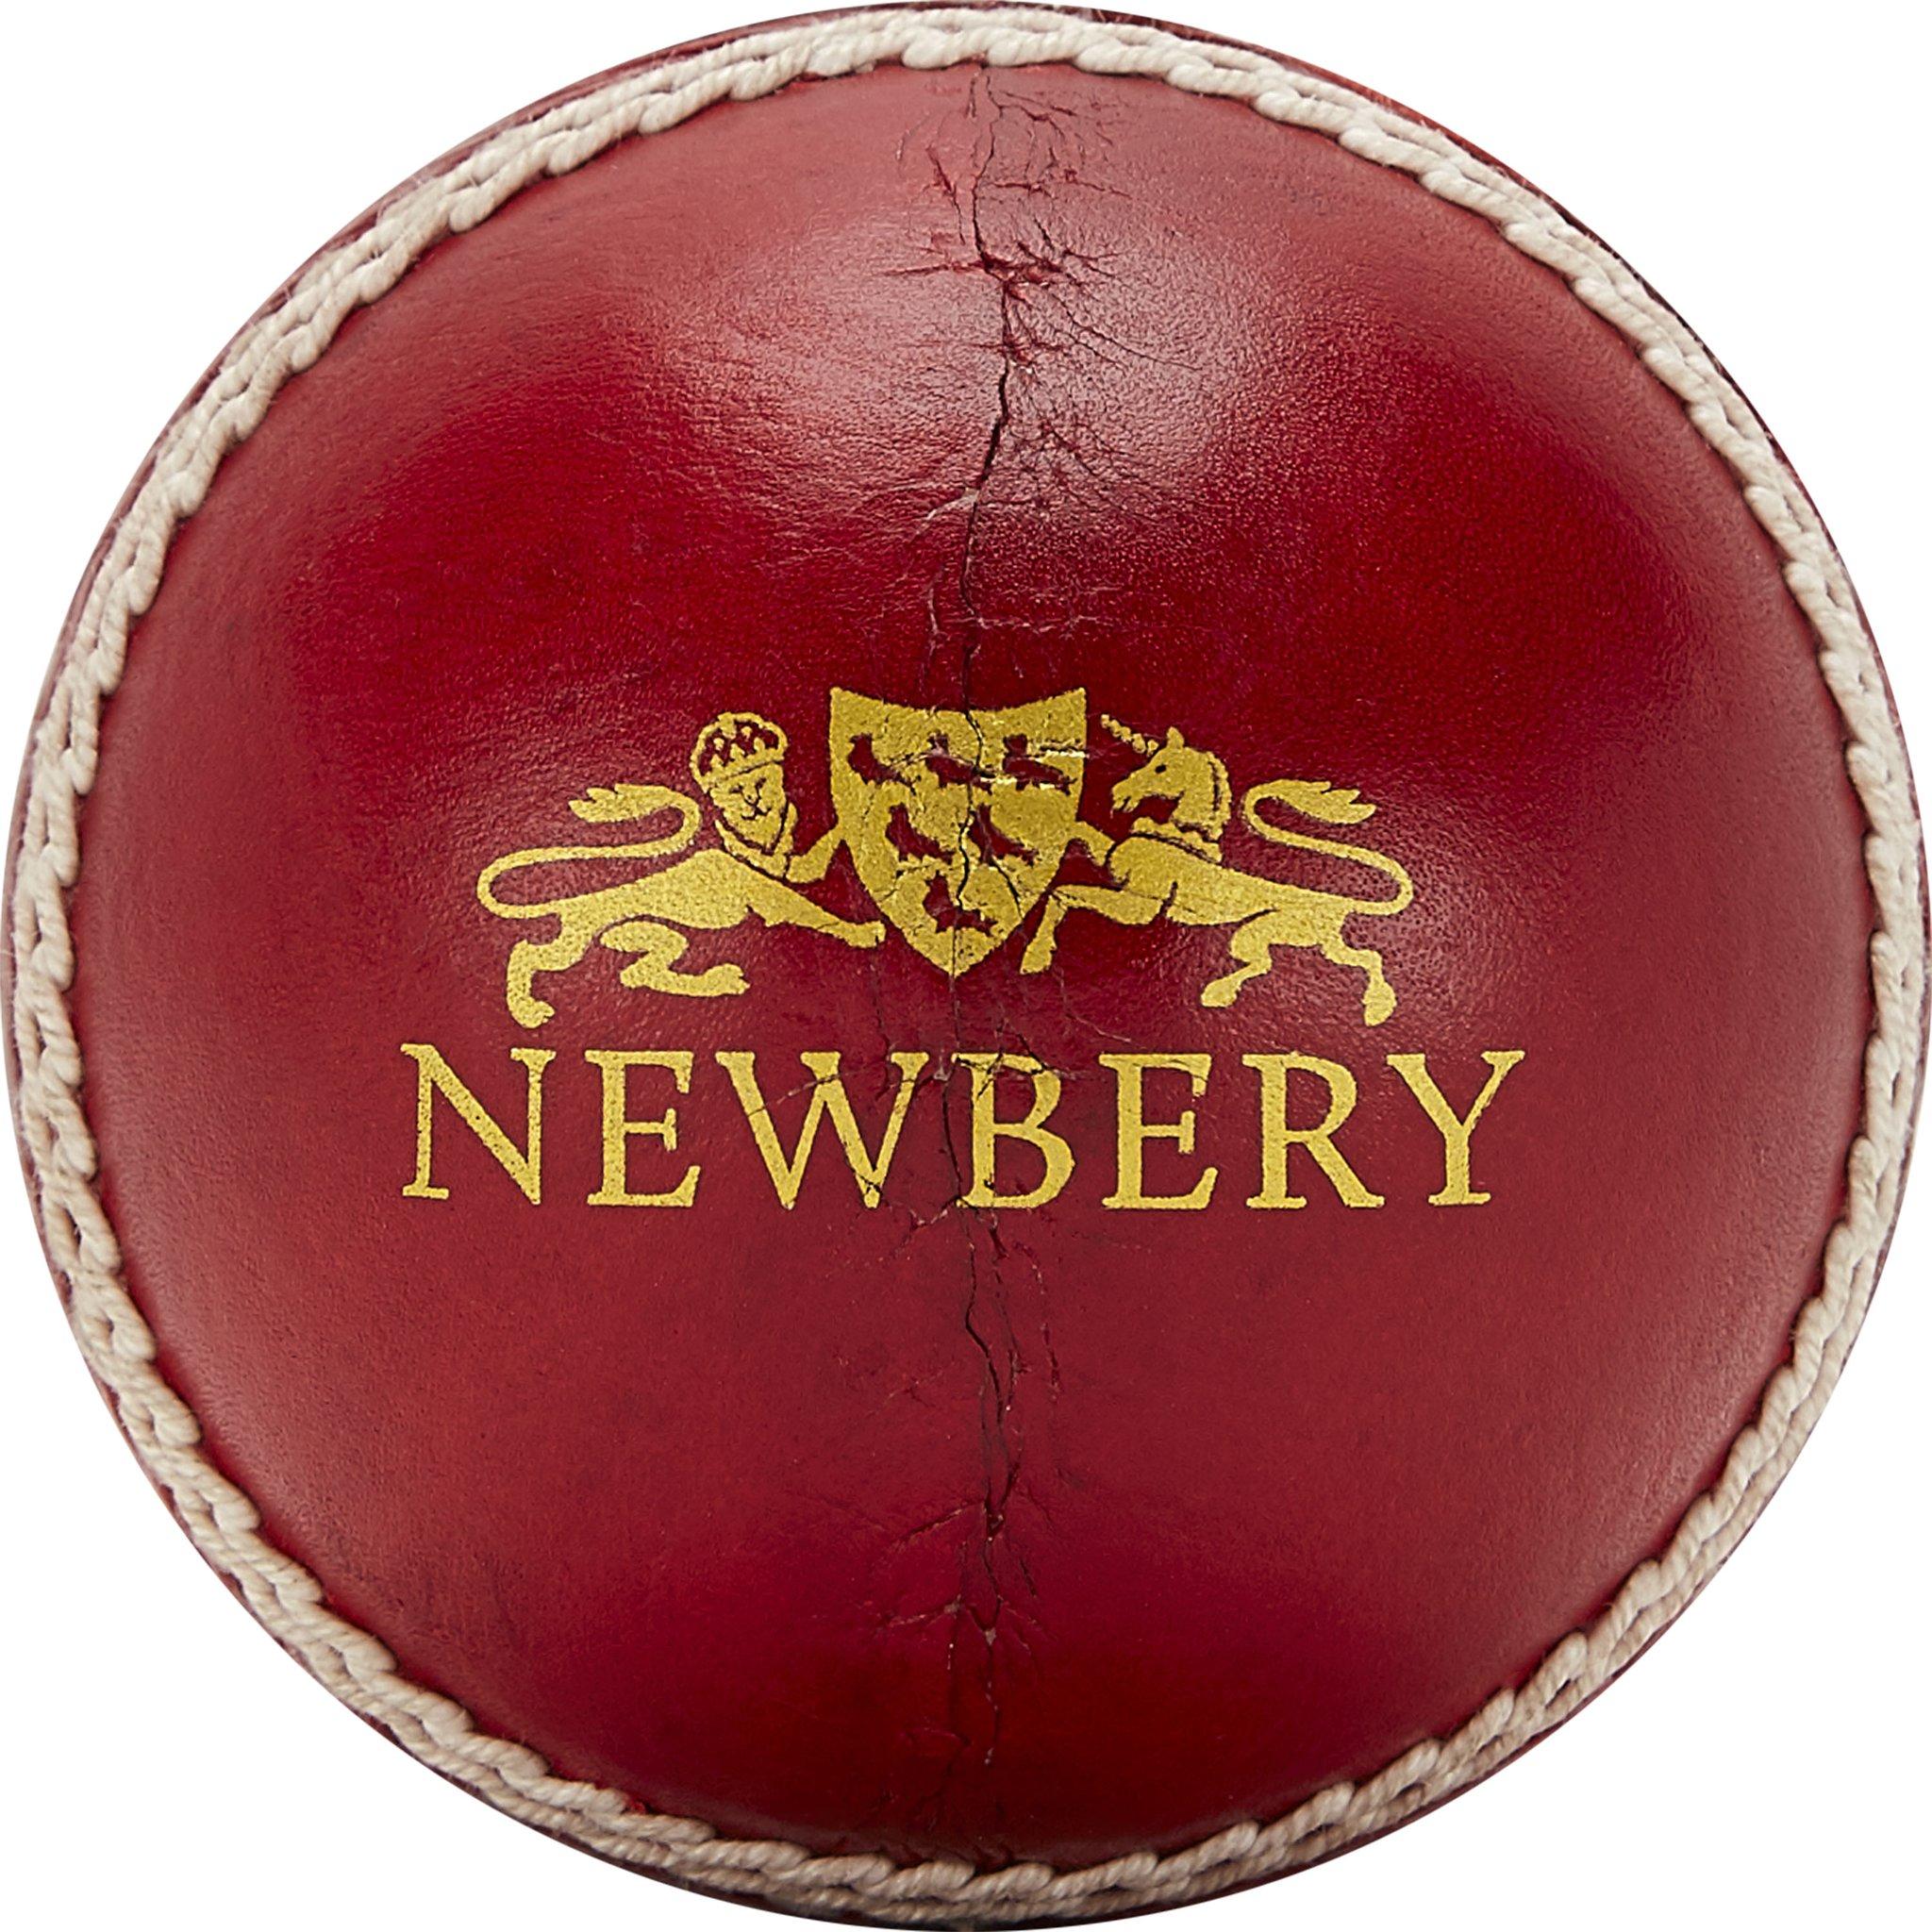 Newbery County Cricket Ball – Newbery Cricket